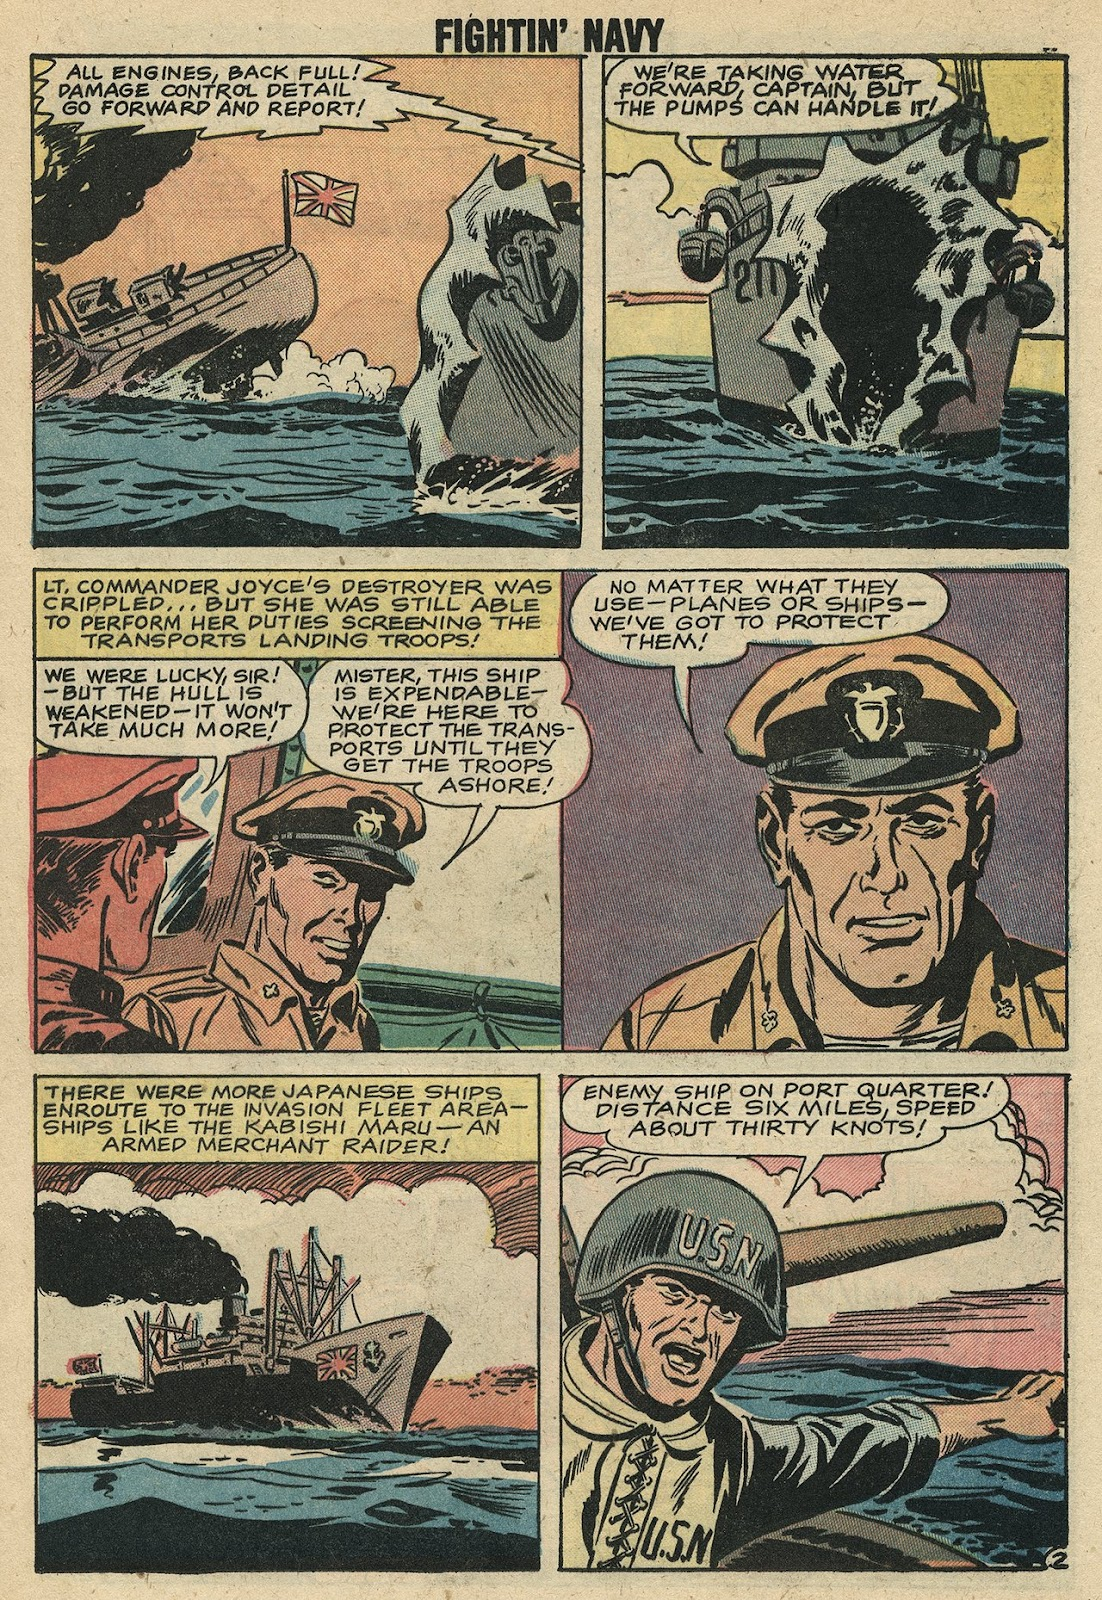 Read online Fightin' Navy comic -  Issue #86 - 12